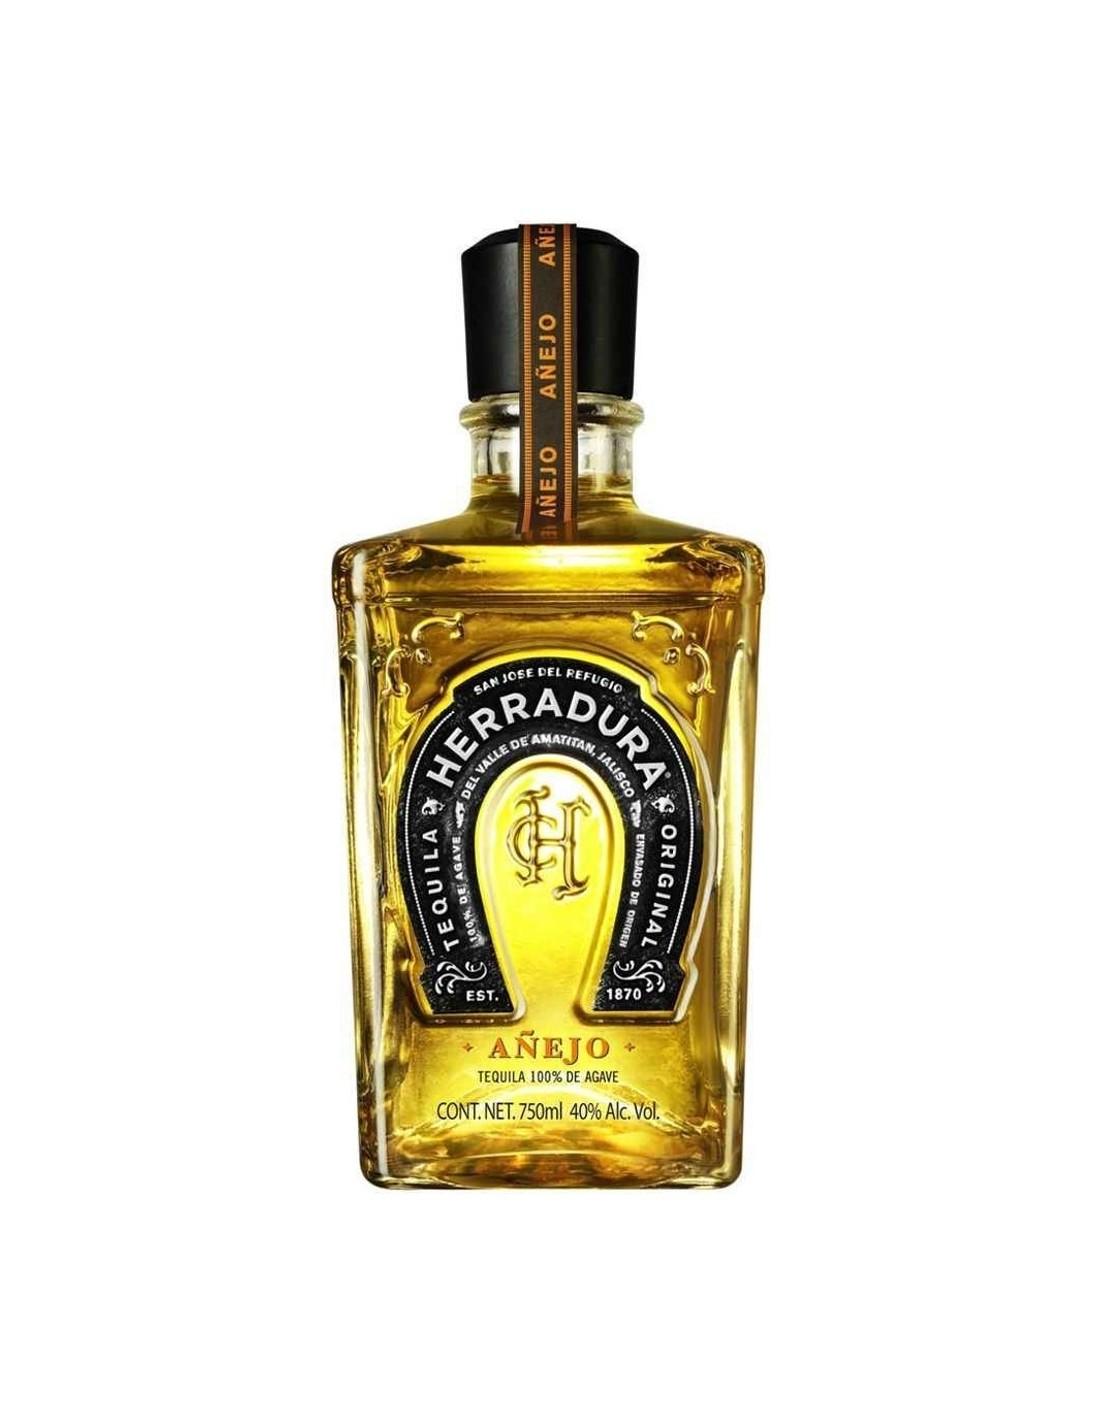 Tequila Herradura Anejo 0.7L, 38% alc., Mexic